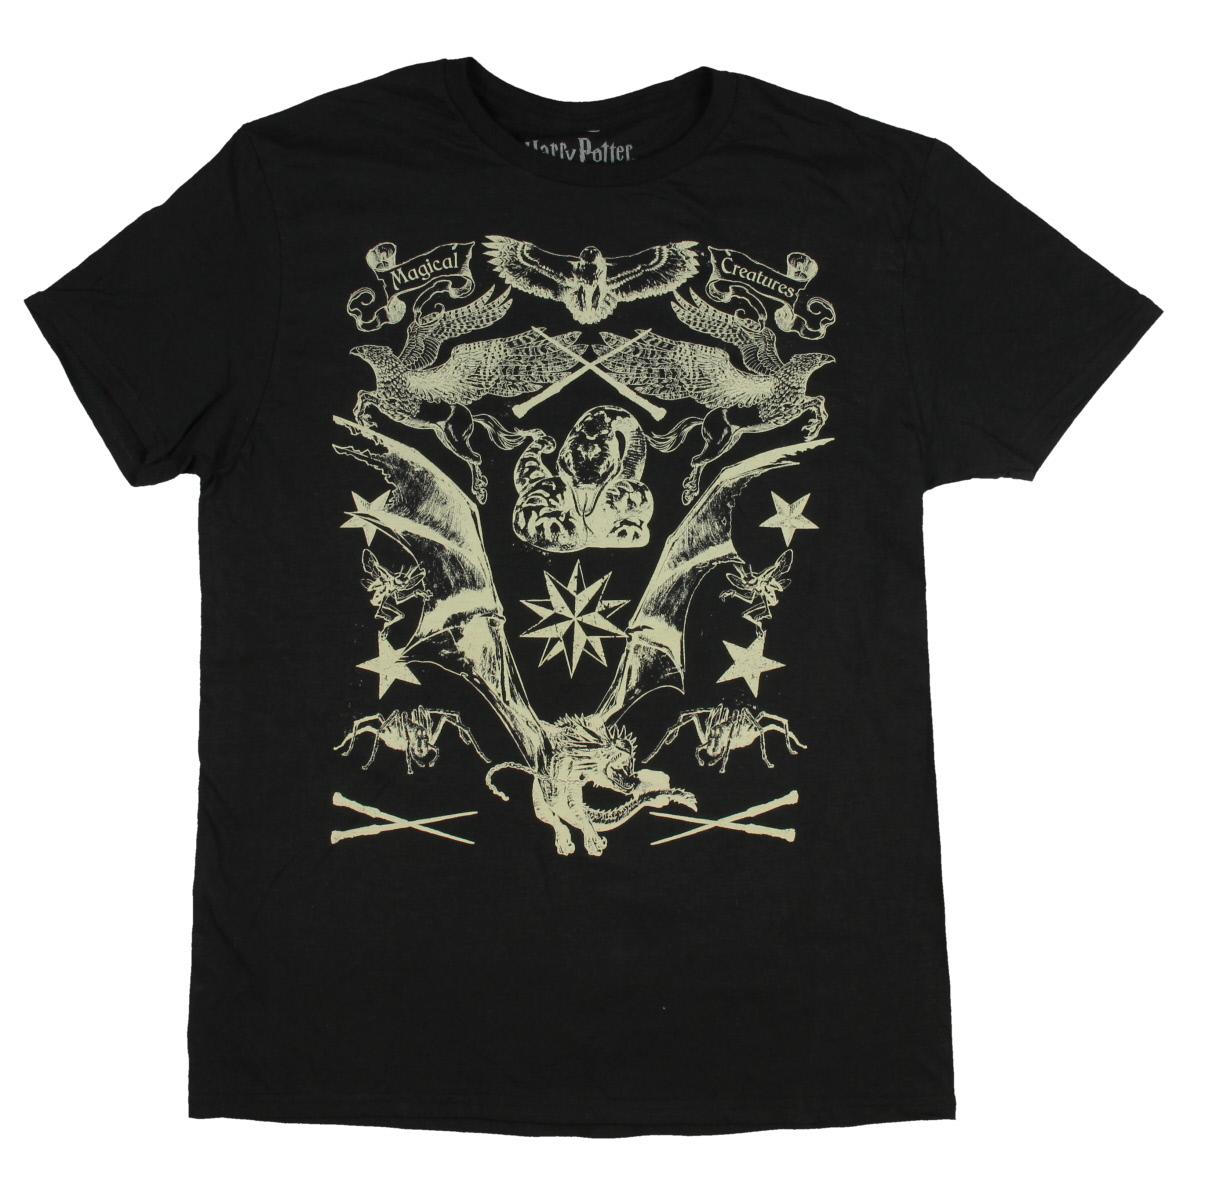 Harry Potter Shirt Magical Creatures Hippogriff Dragon Acromatula Nagini Women's Sketch Drawings T-Shirt